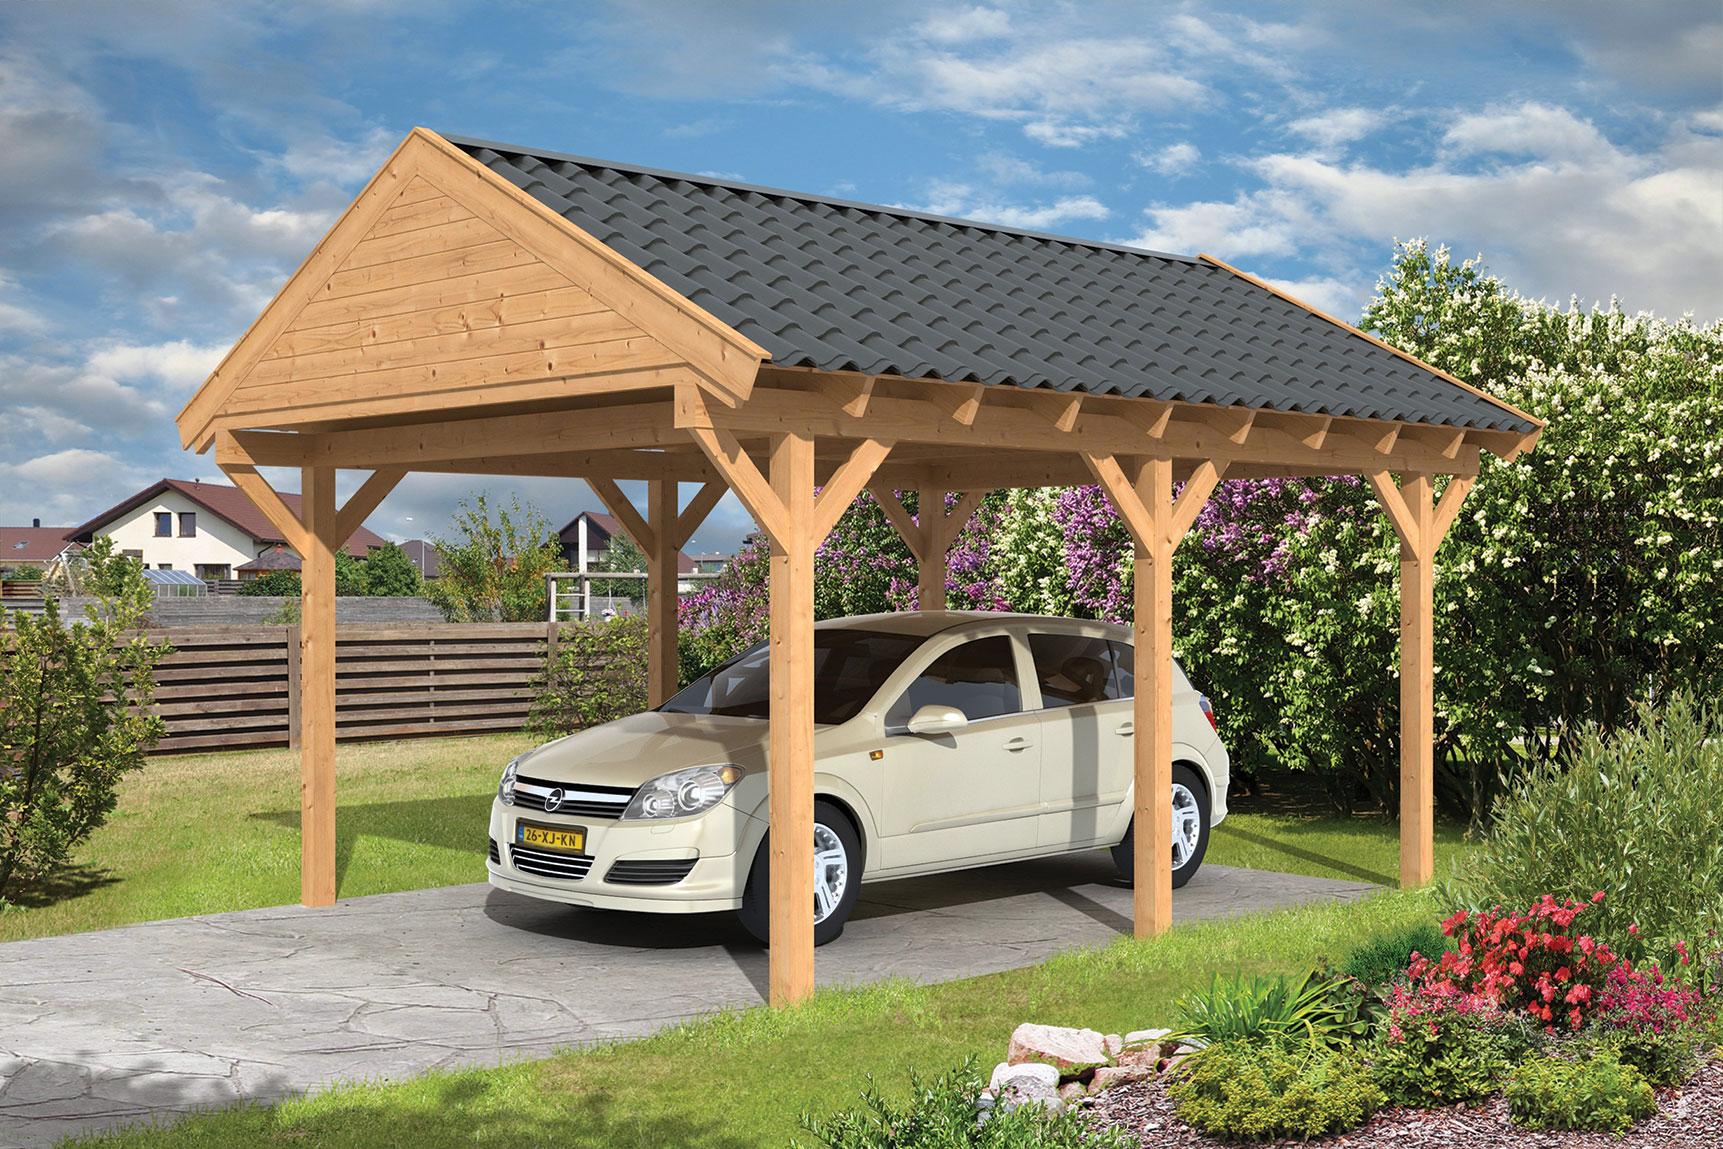 Carport hout met zadeldak workum lariks douglas 430 x 600 cm - Carport foto ...